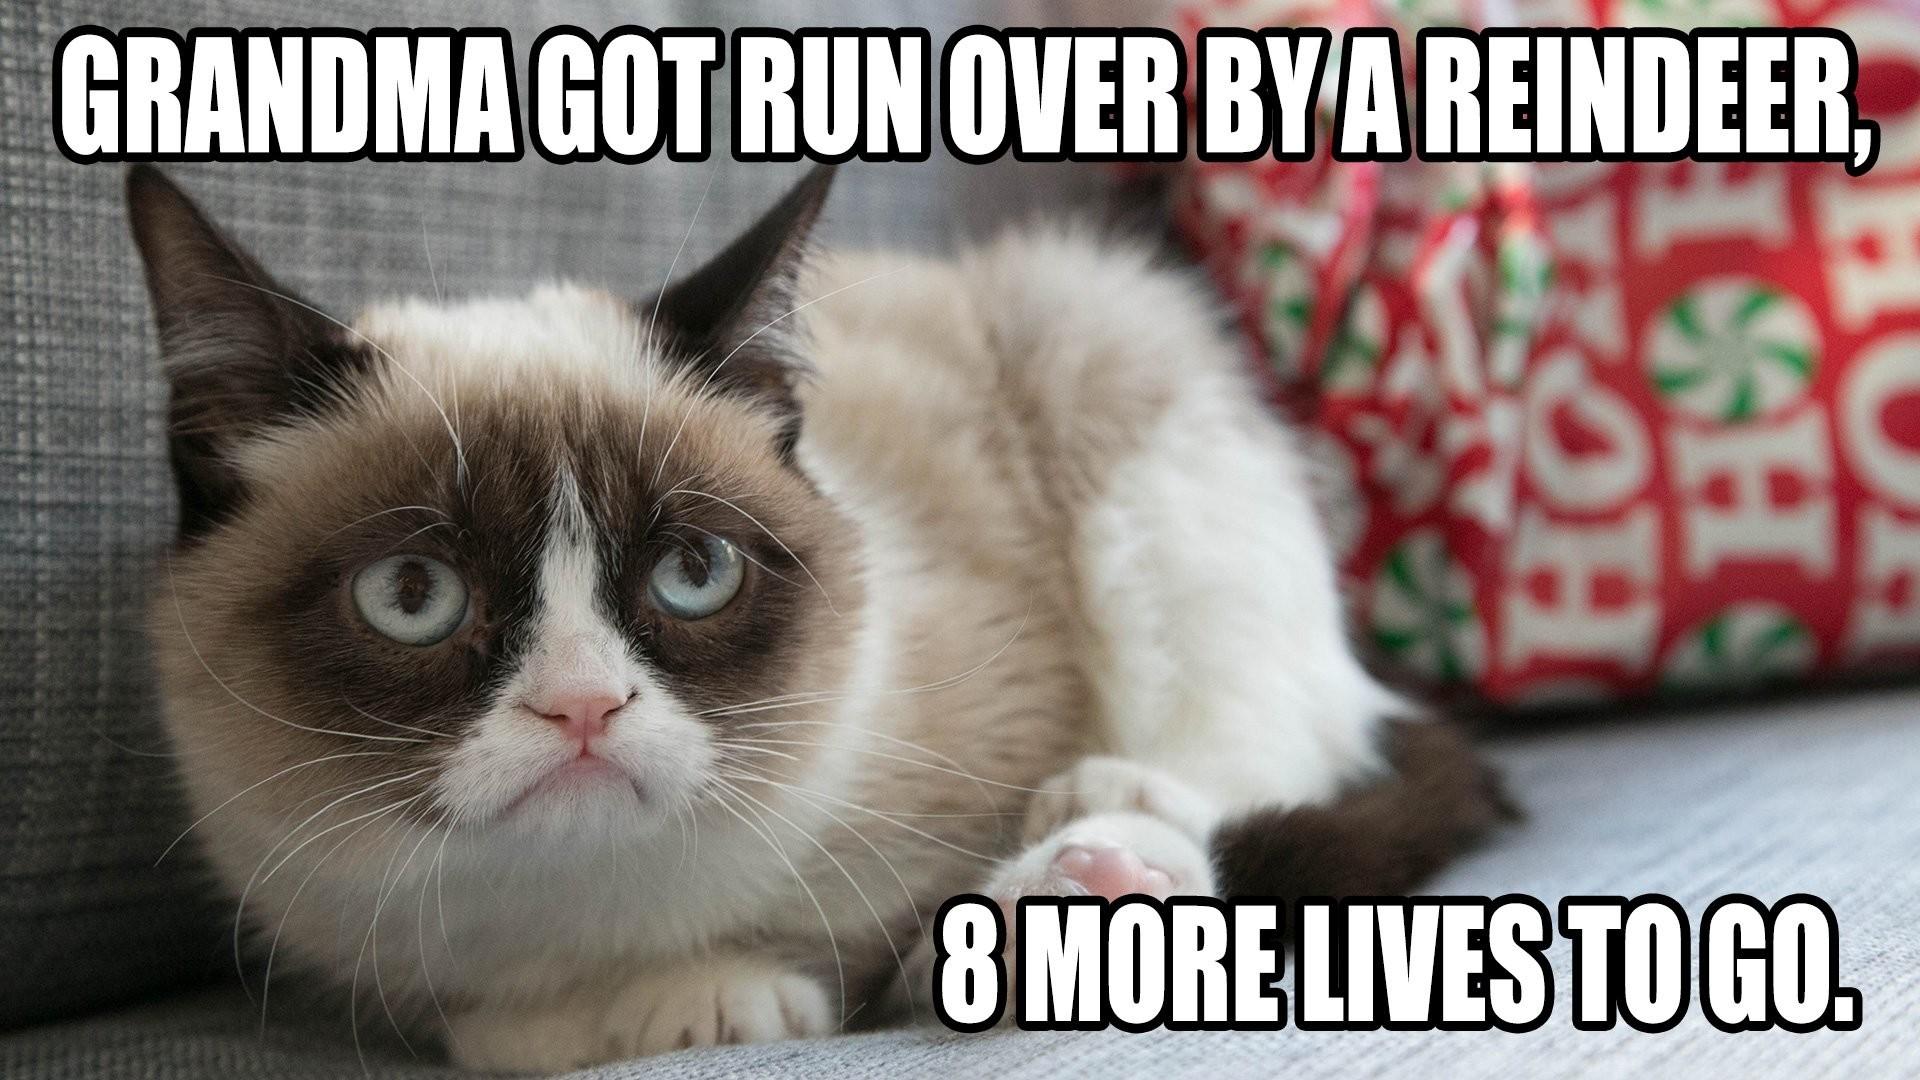 cat meme quote funny humor grumpy (7) wallpaper background